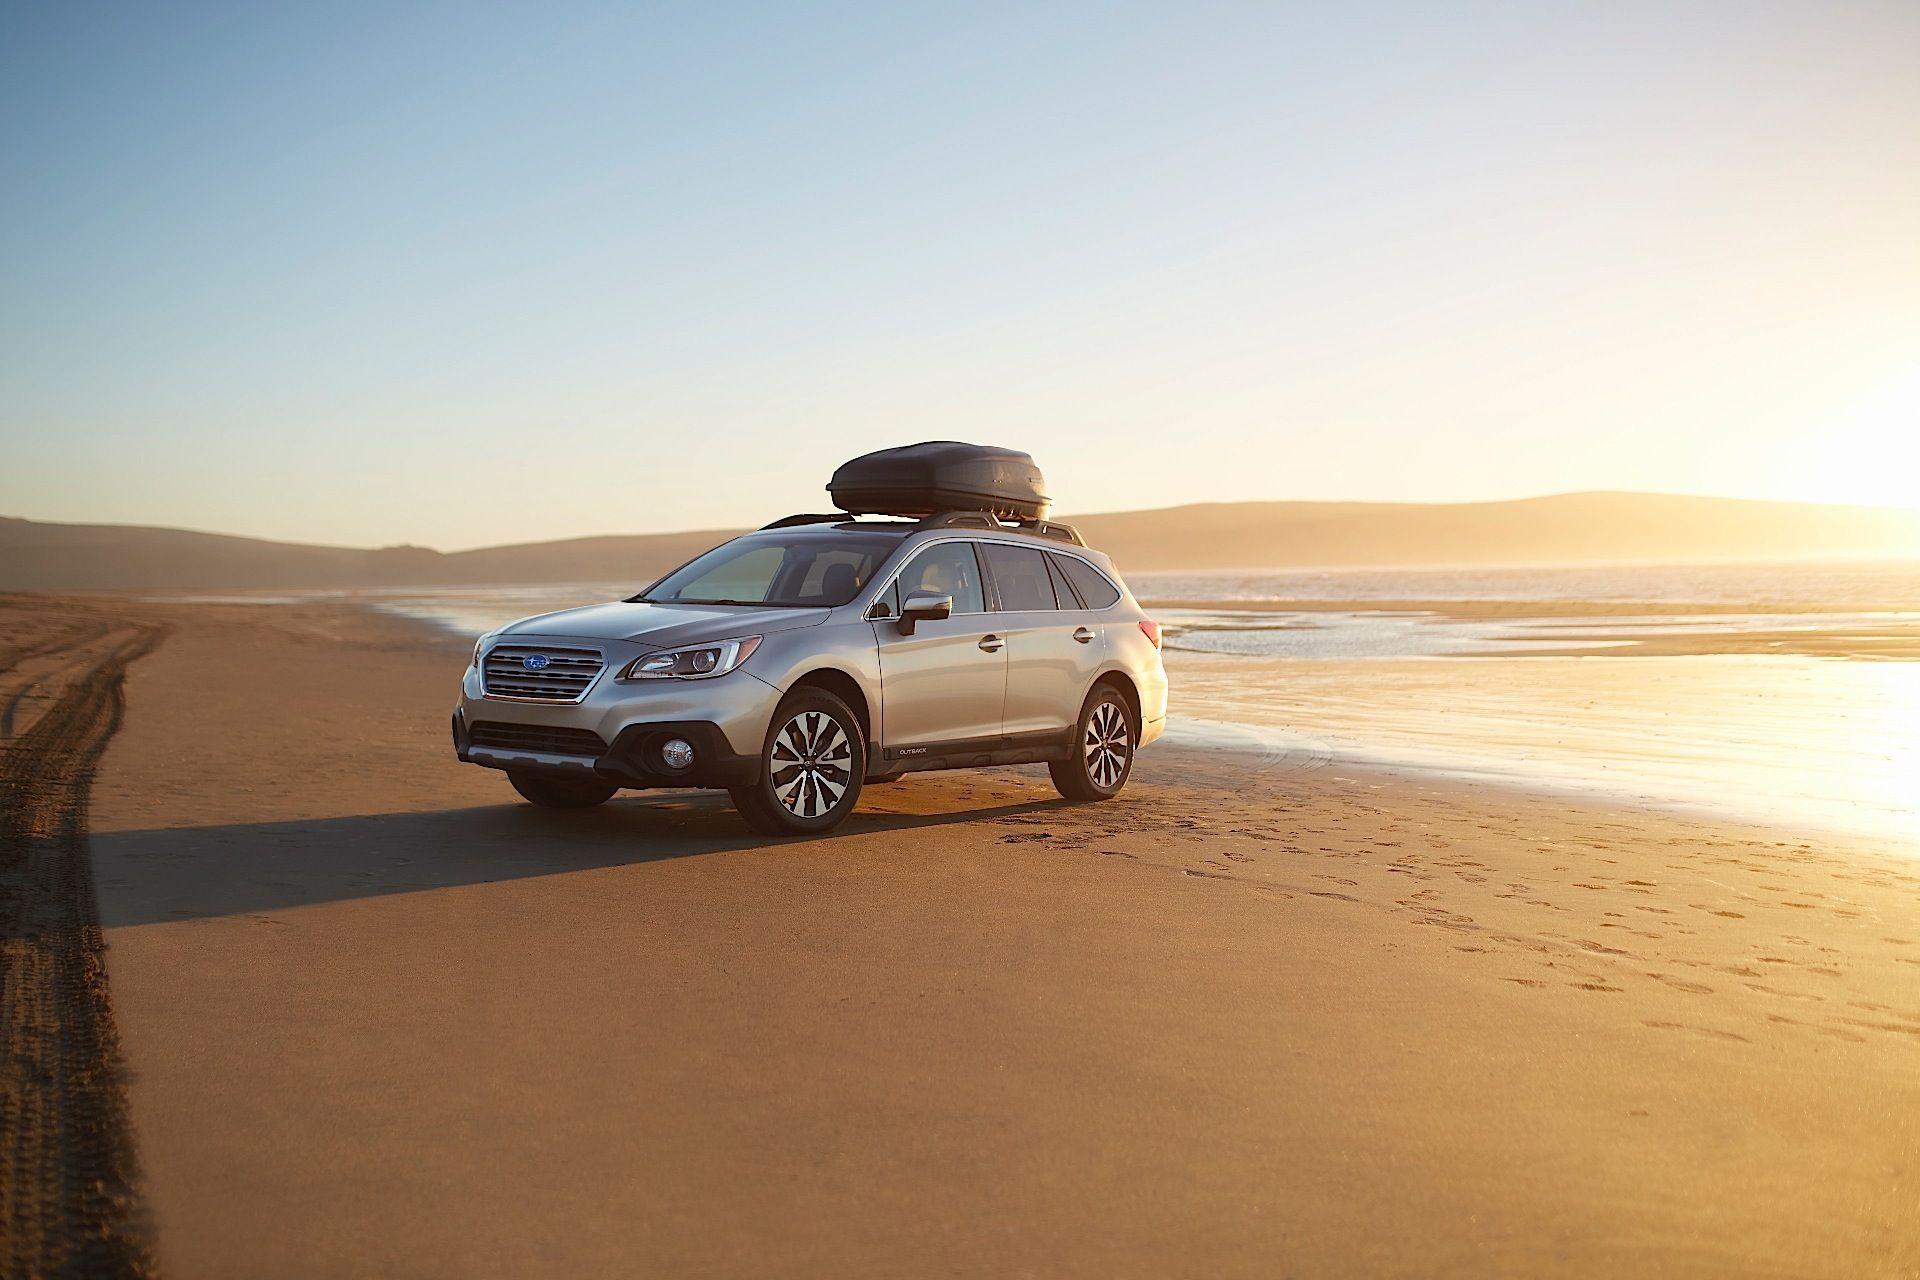 SUBARU Outback (2014 Present) Subaru outback 2015